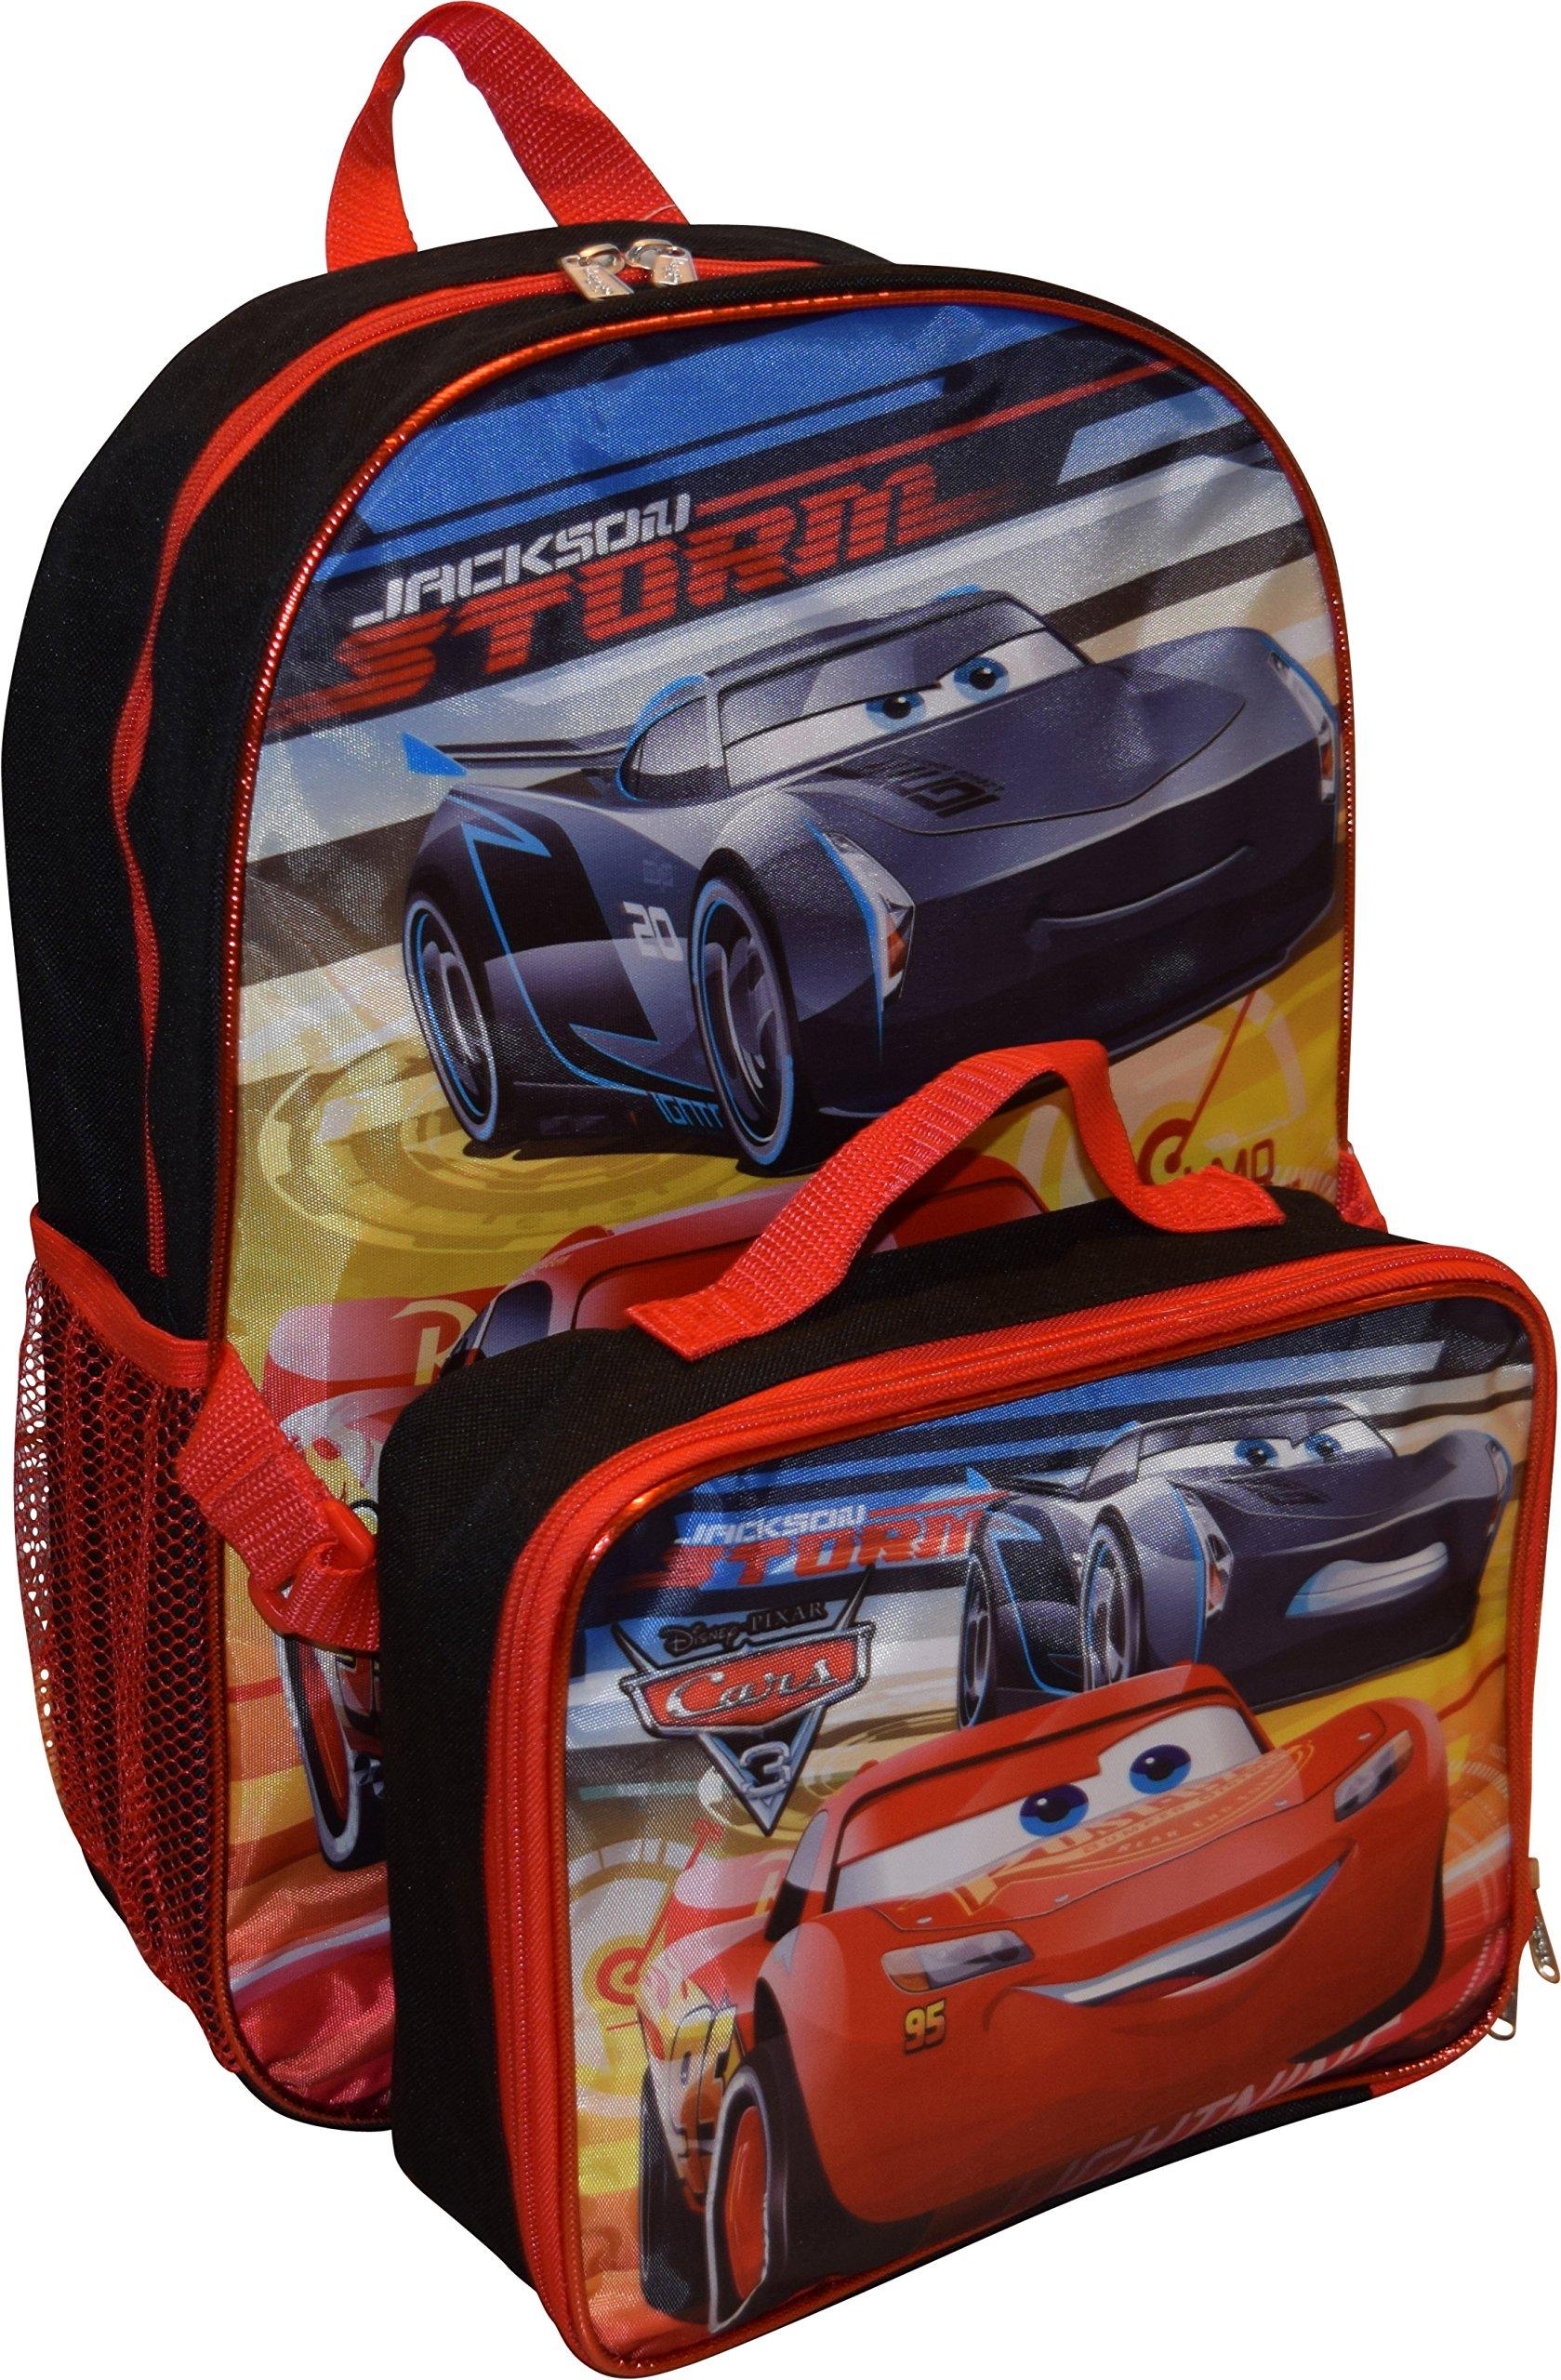 e842bc325ac Get Quotations · Disney Pixar Cars Jackson   Lightning McQueen 16